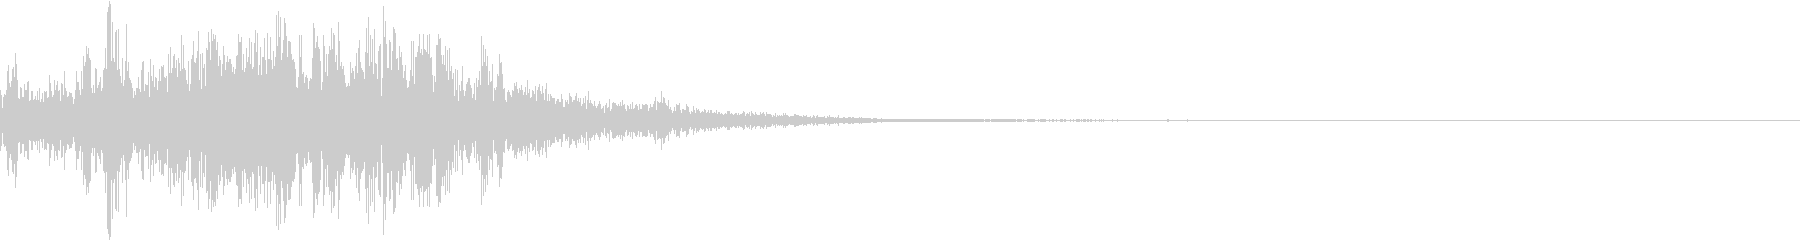 CINEMATIC SFX_HEAVYの未再生の波形